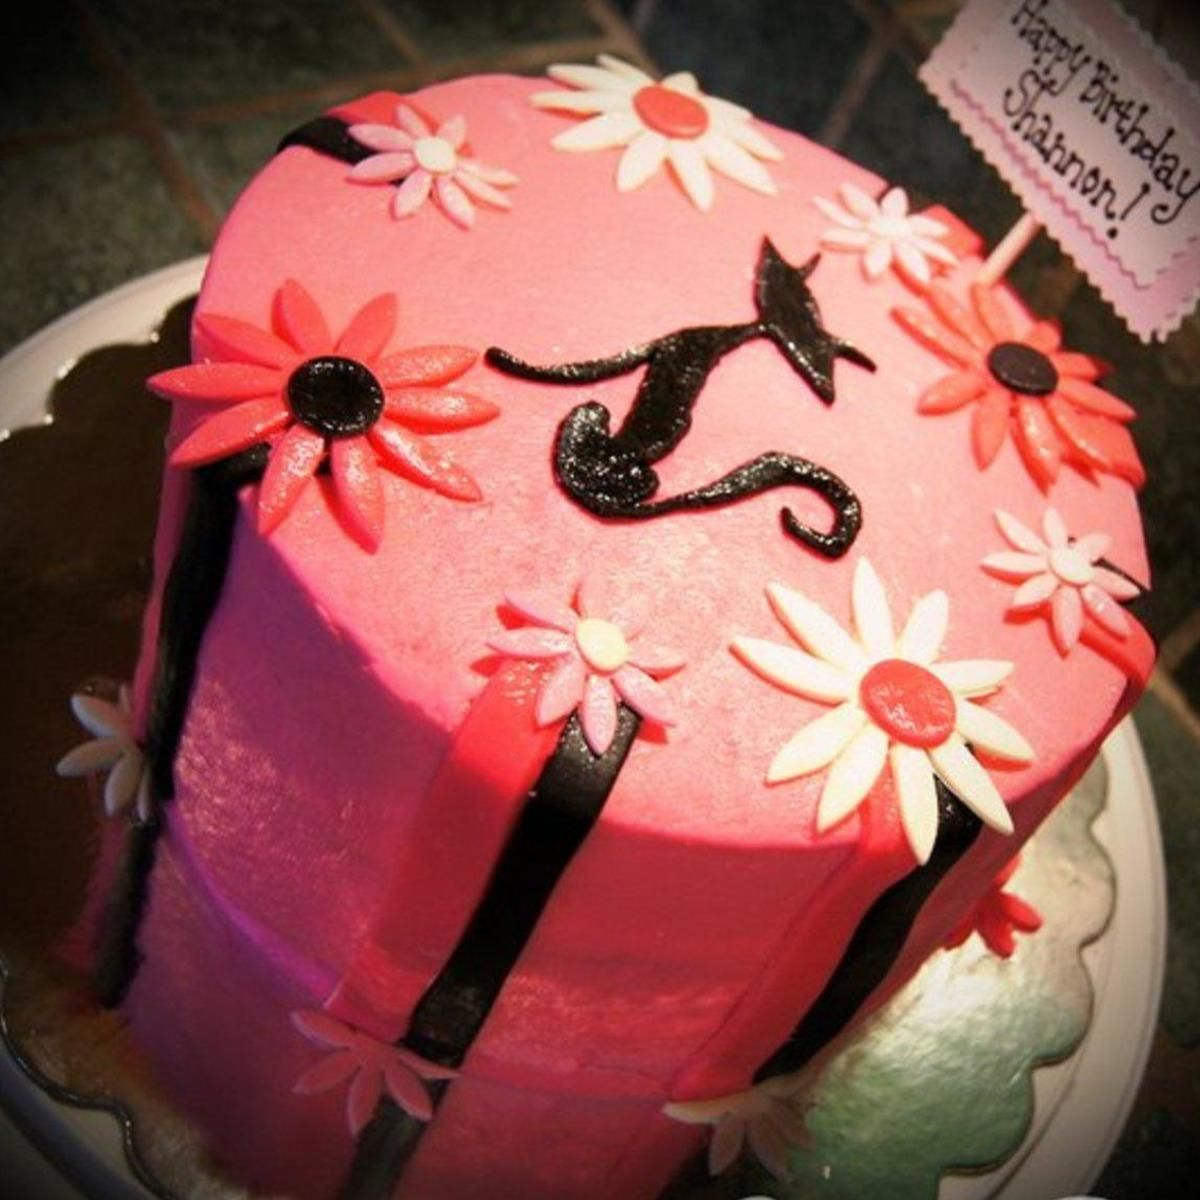 Crusting Buttercream - Cake Decorators Frosting #crustingbuttercream